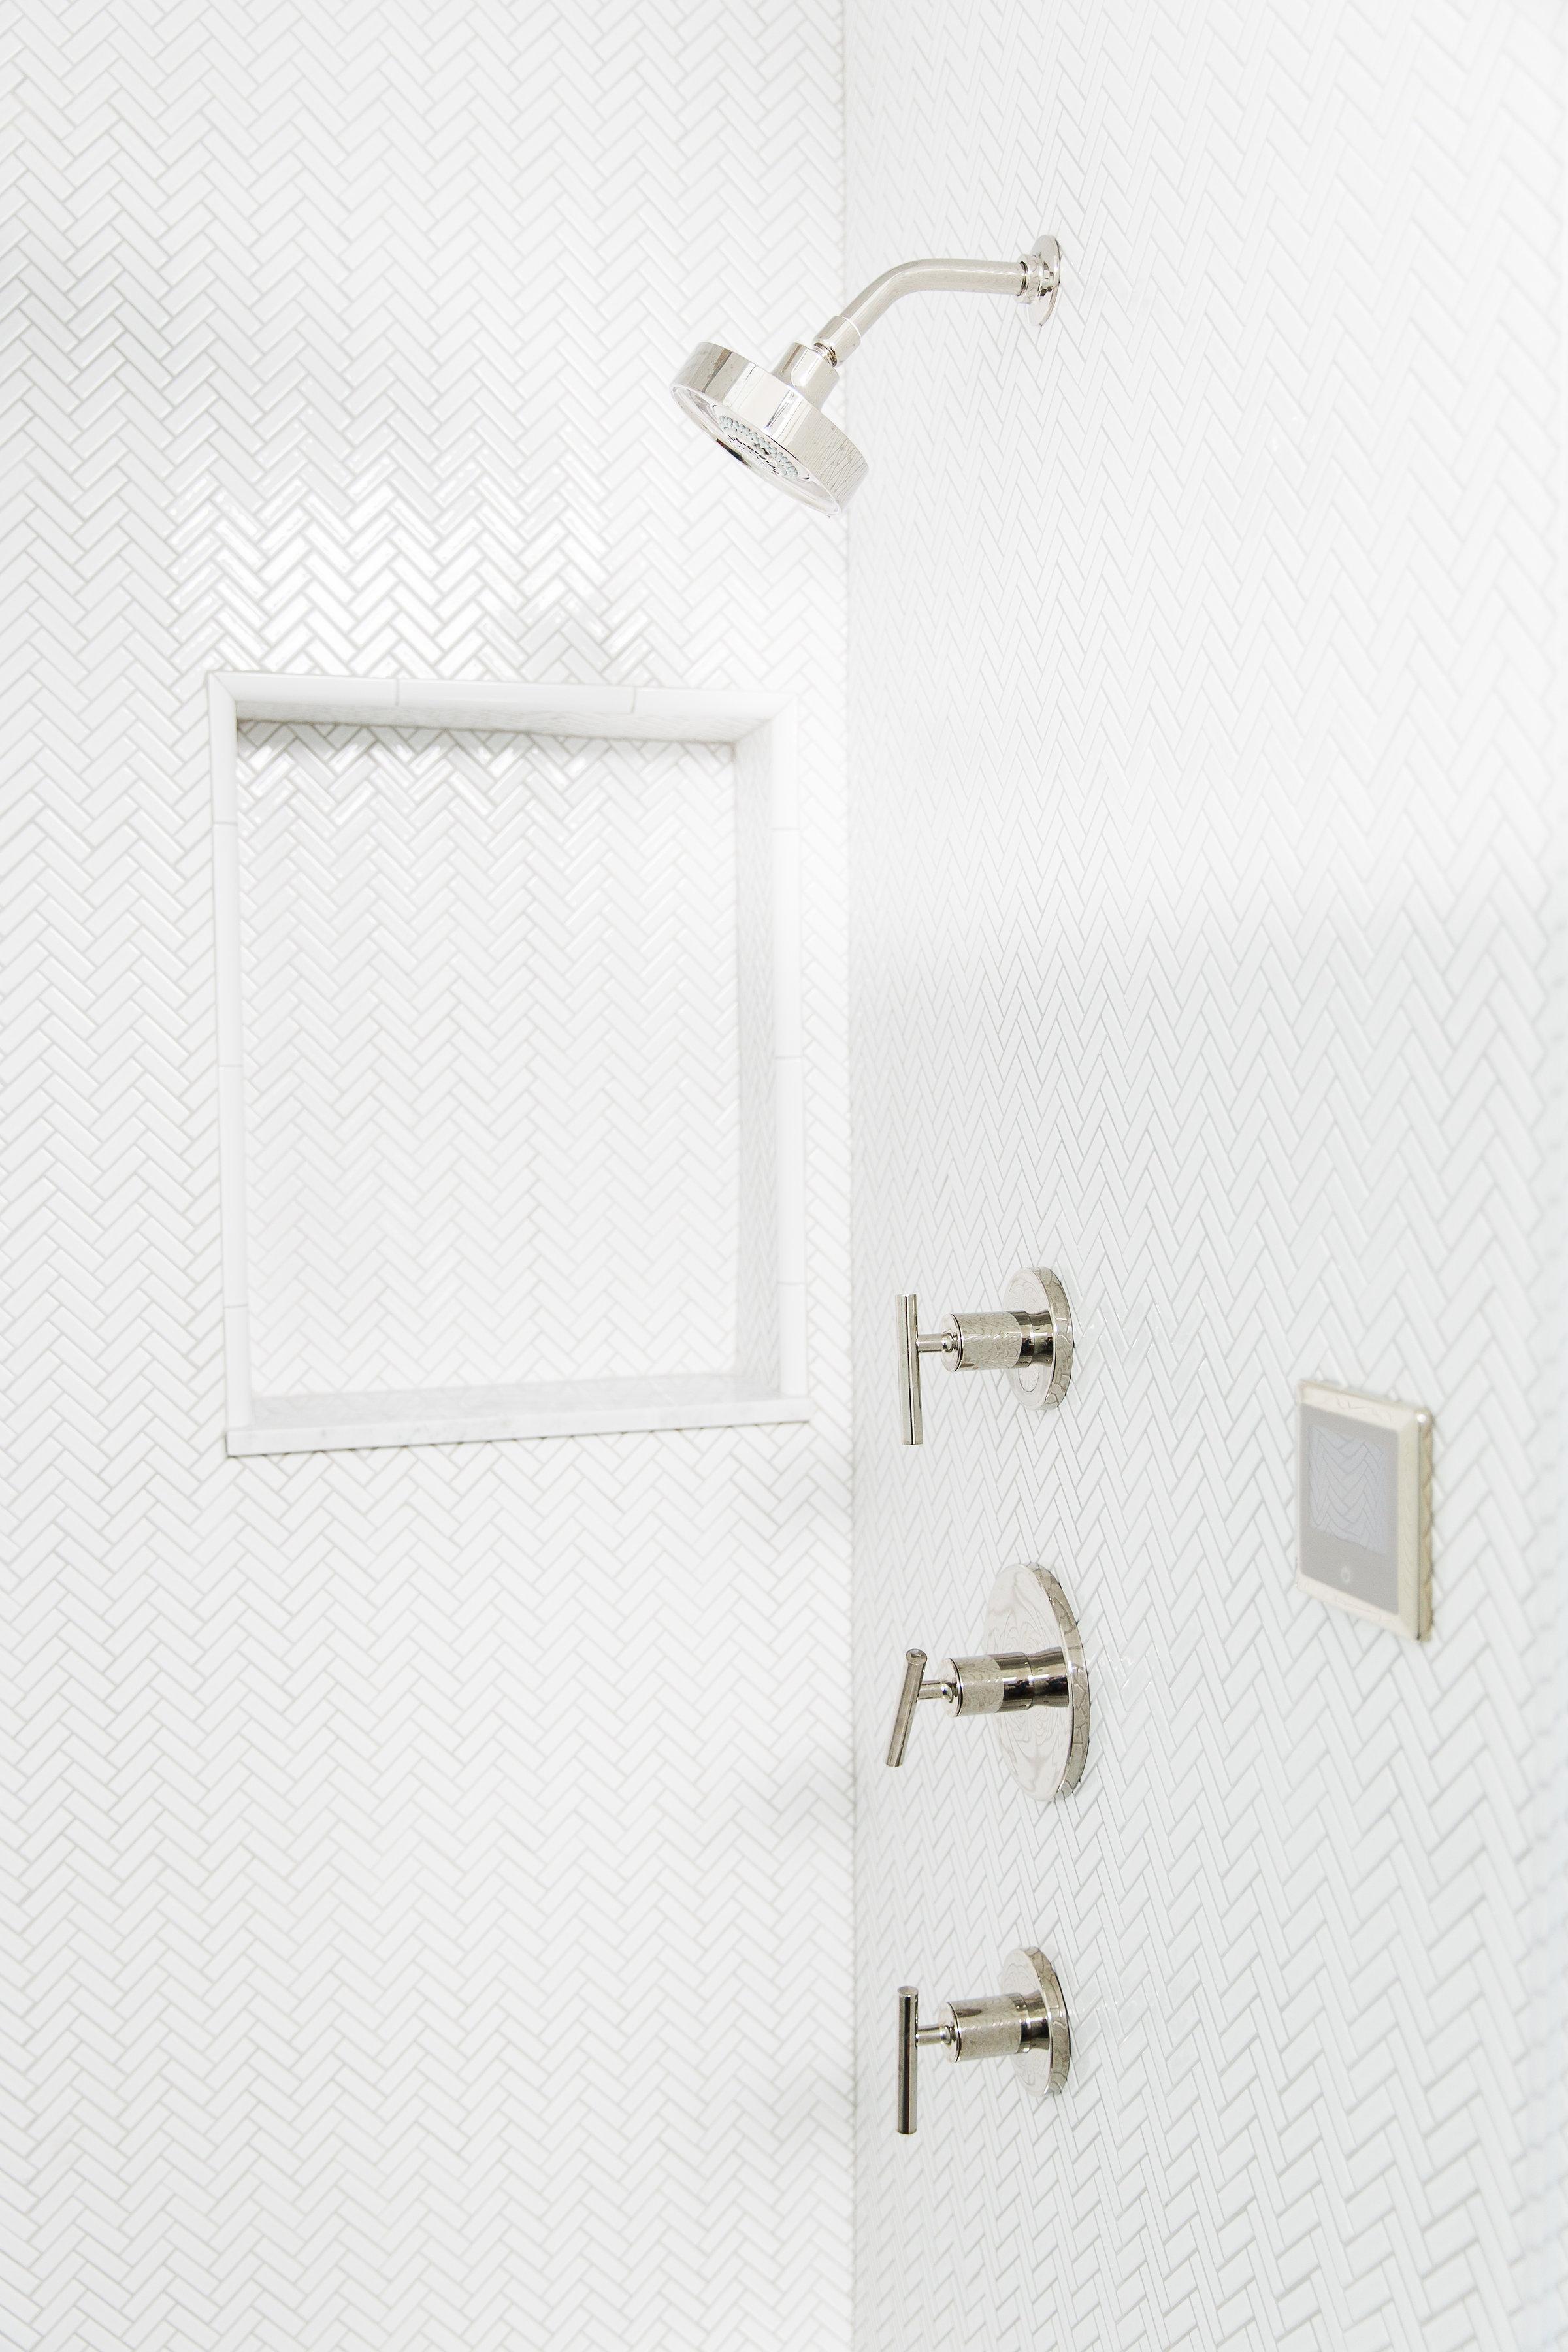 Herringbone tile with gray grout || Studio McGee